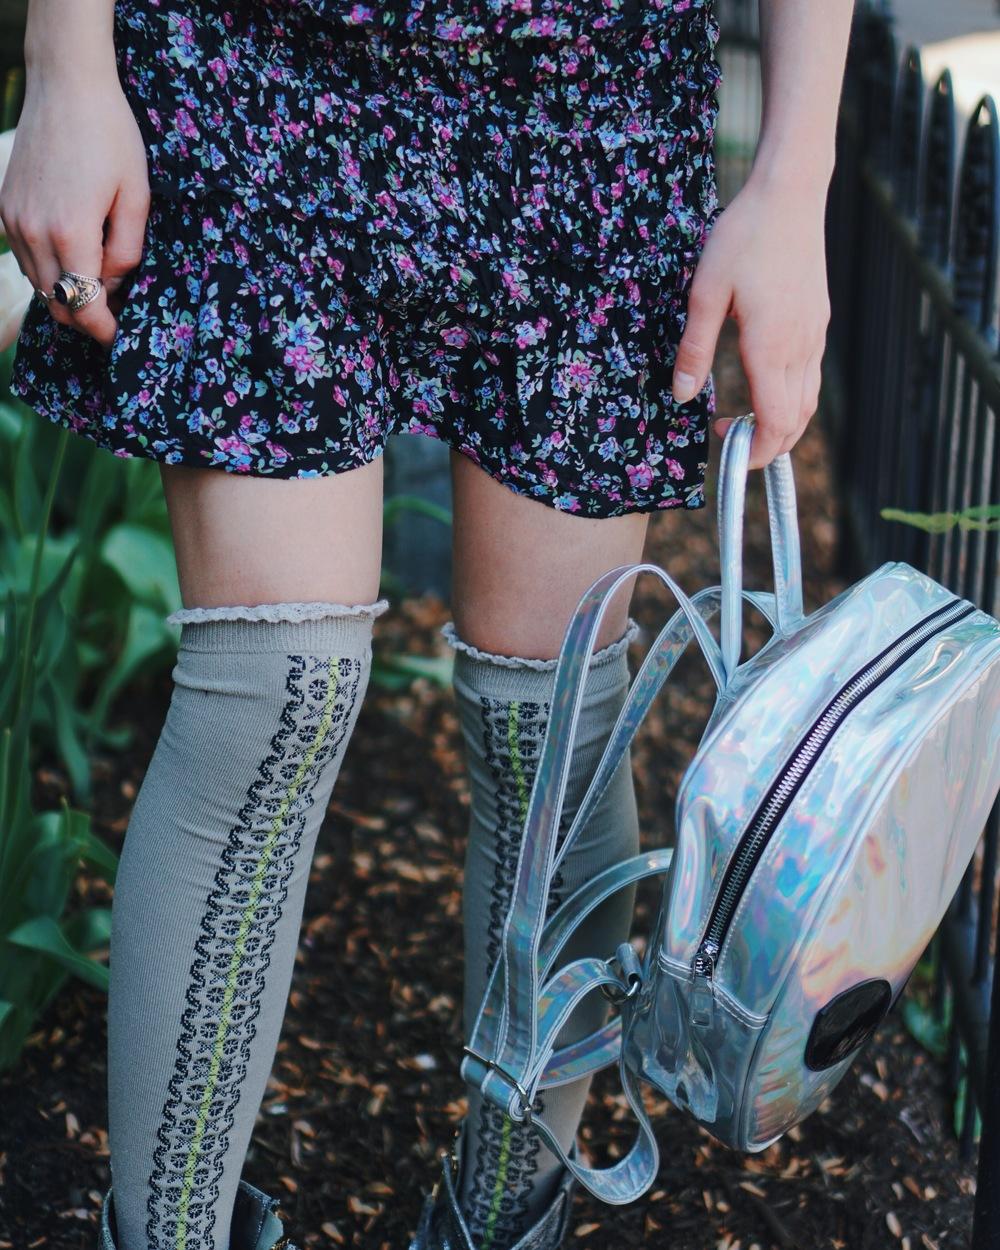 dress: free people | choker: dollskill | backpack: disturbia | thigh highs: free people | boots: free people